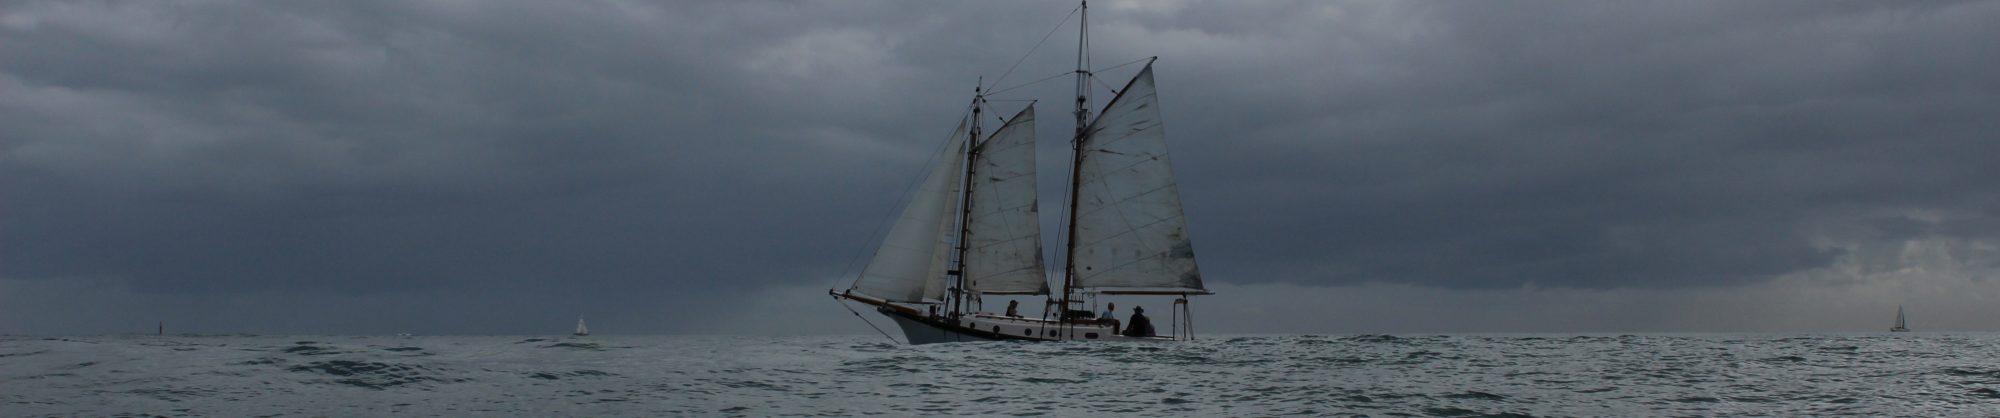 Ashanti - gaff rigged schooner